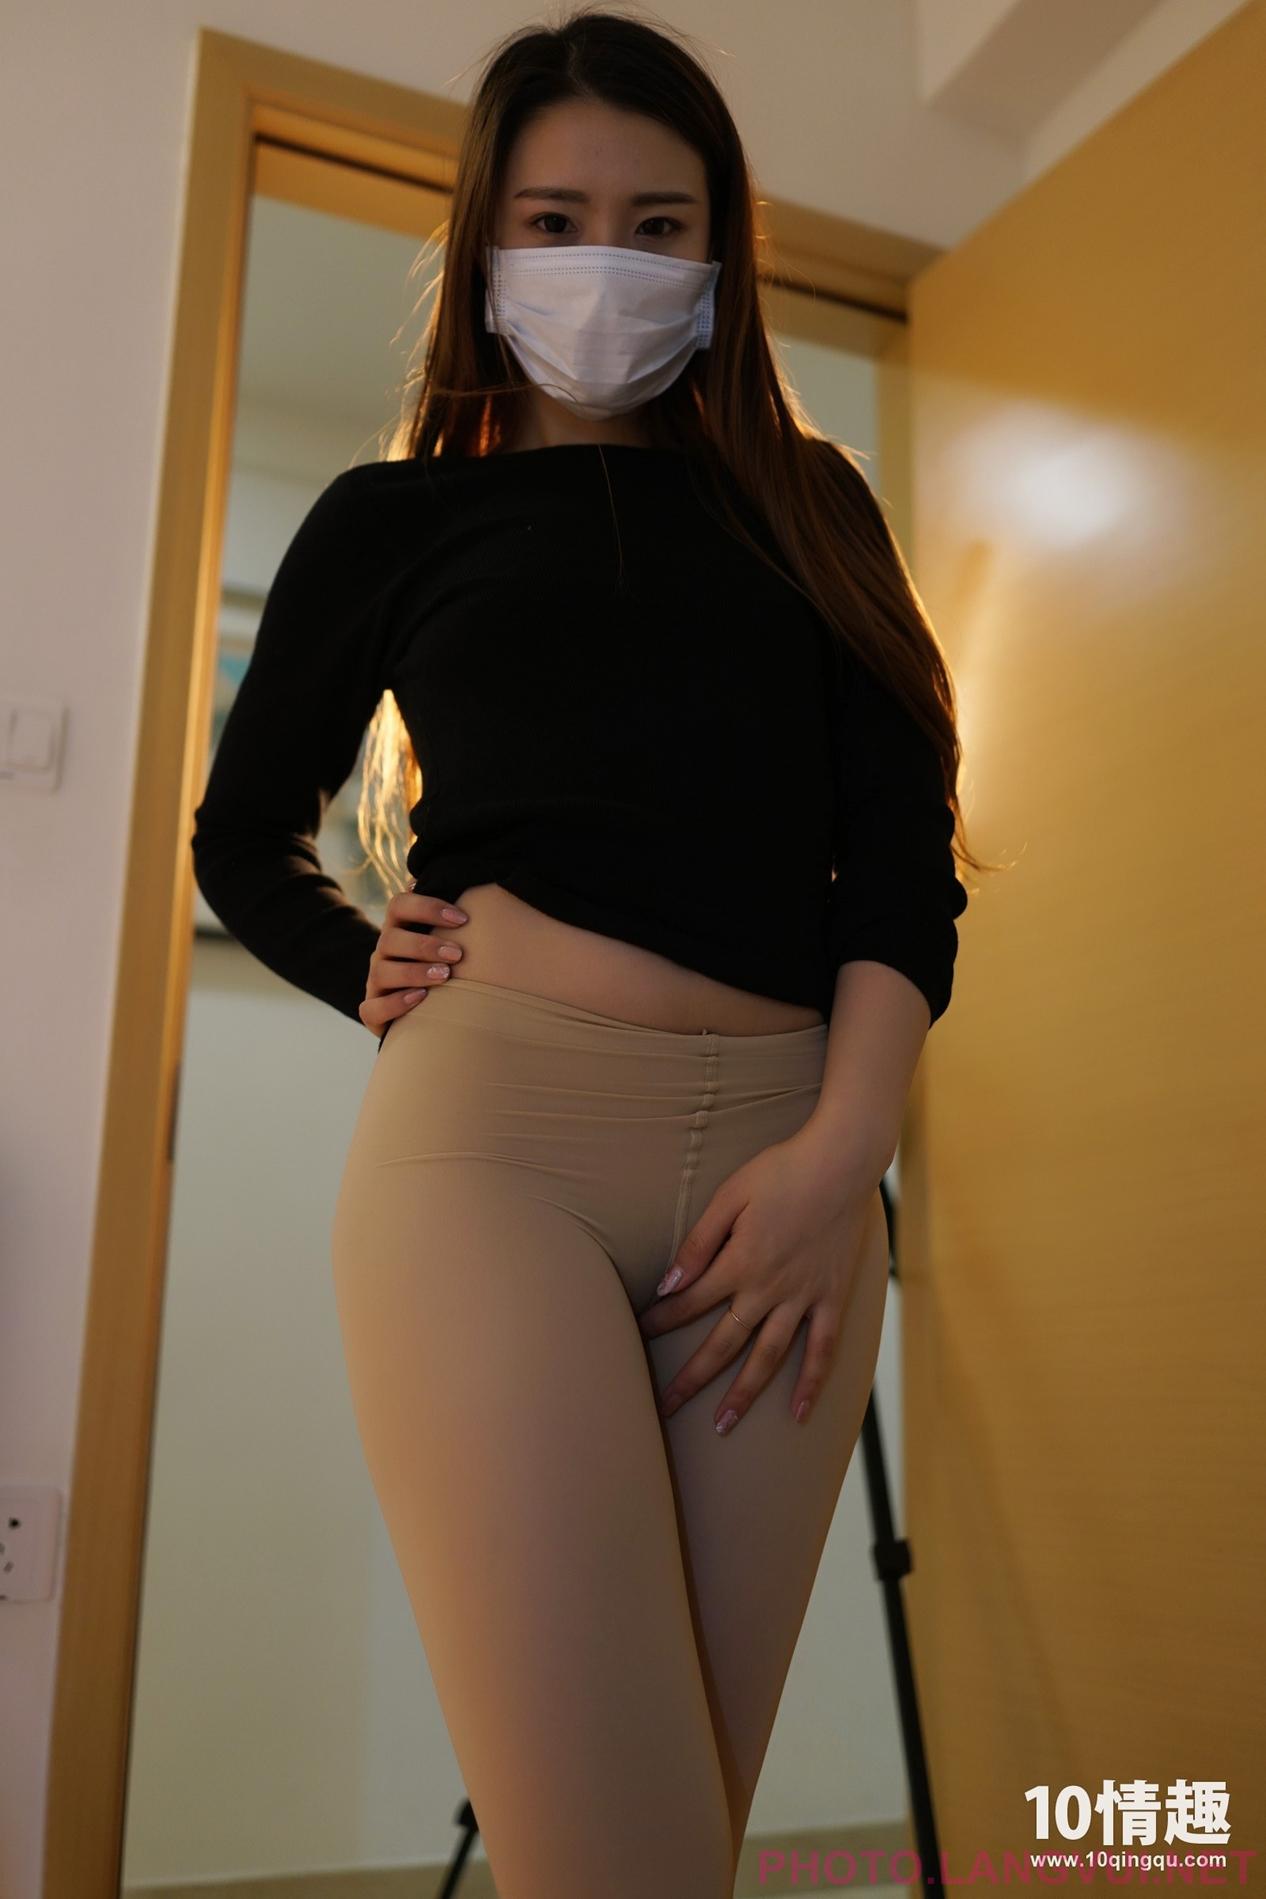 10QingQu Mask Series No 284